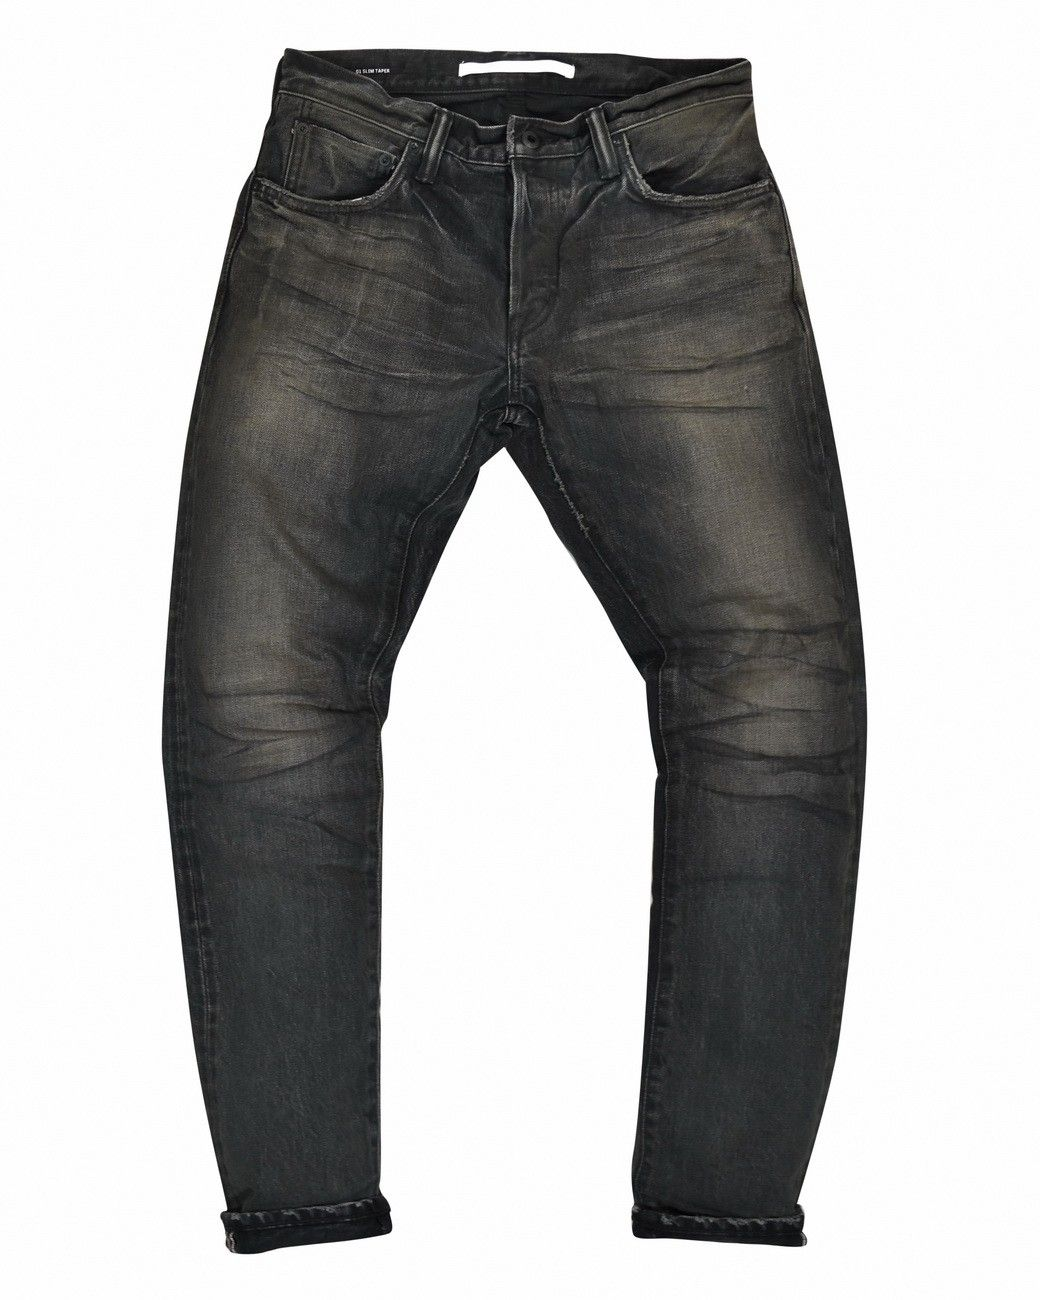 MASTERCRAFT UNION - Herrenjeans - Slim Taper 13,5 oz. - Black x Black